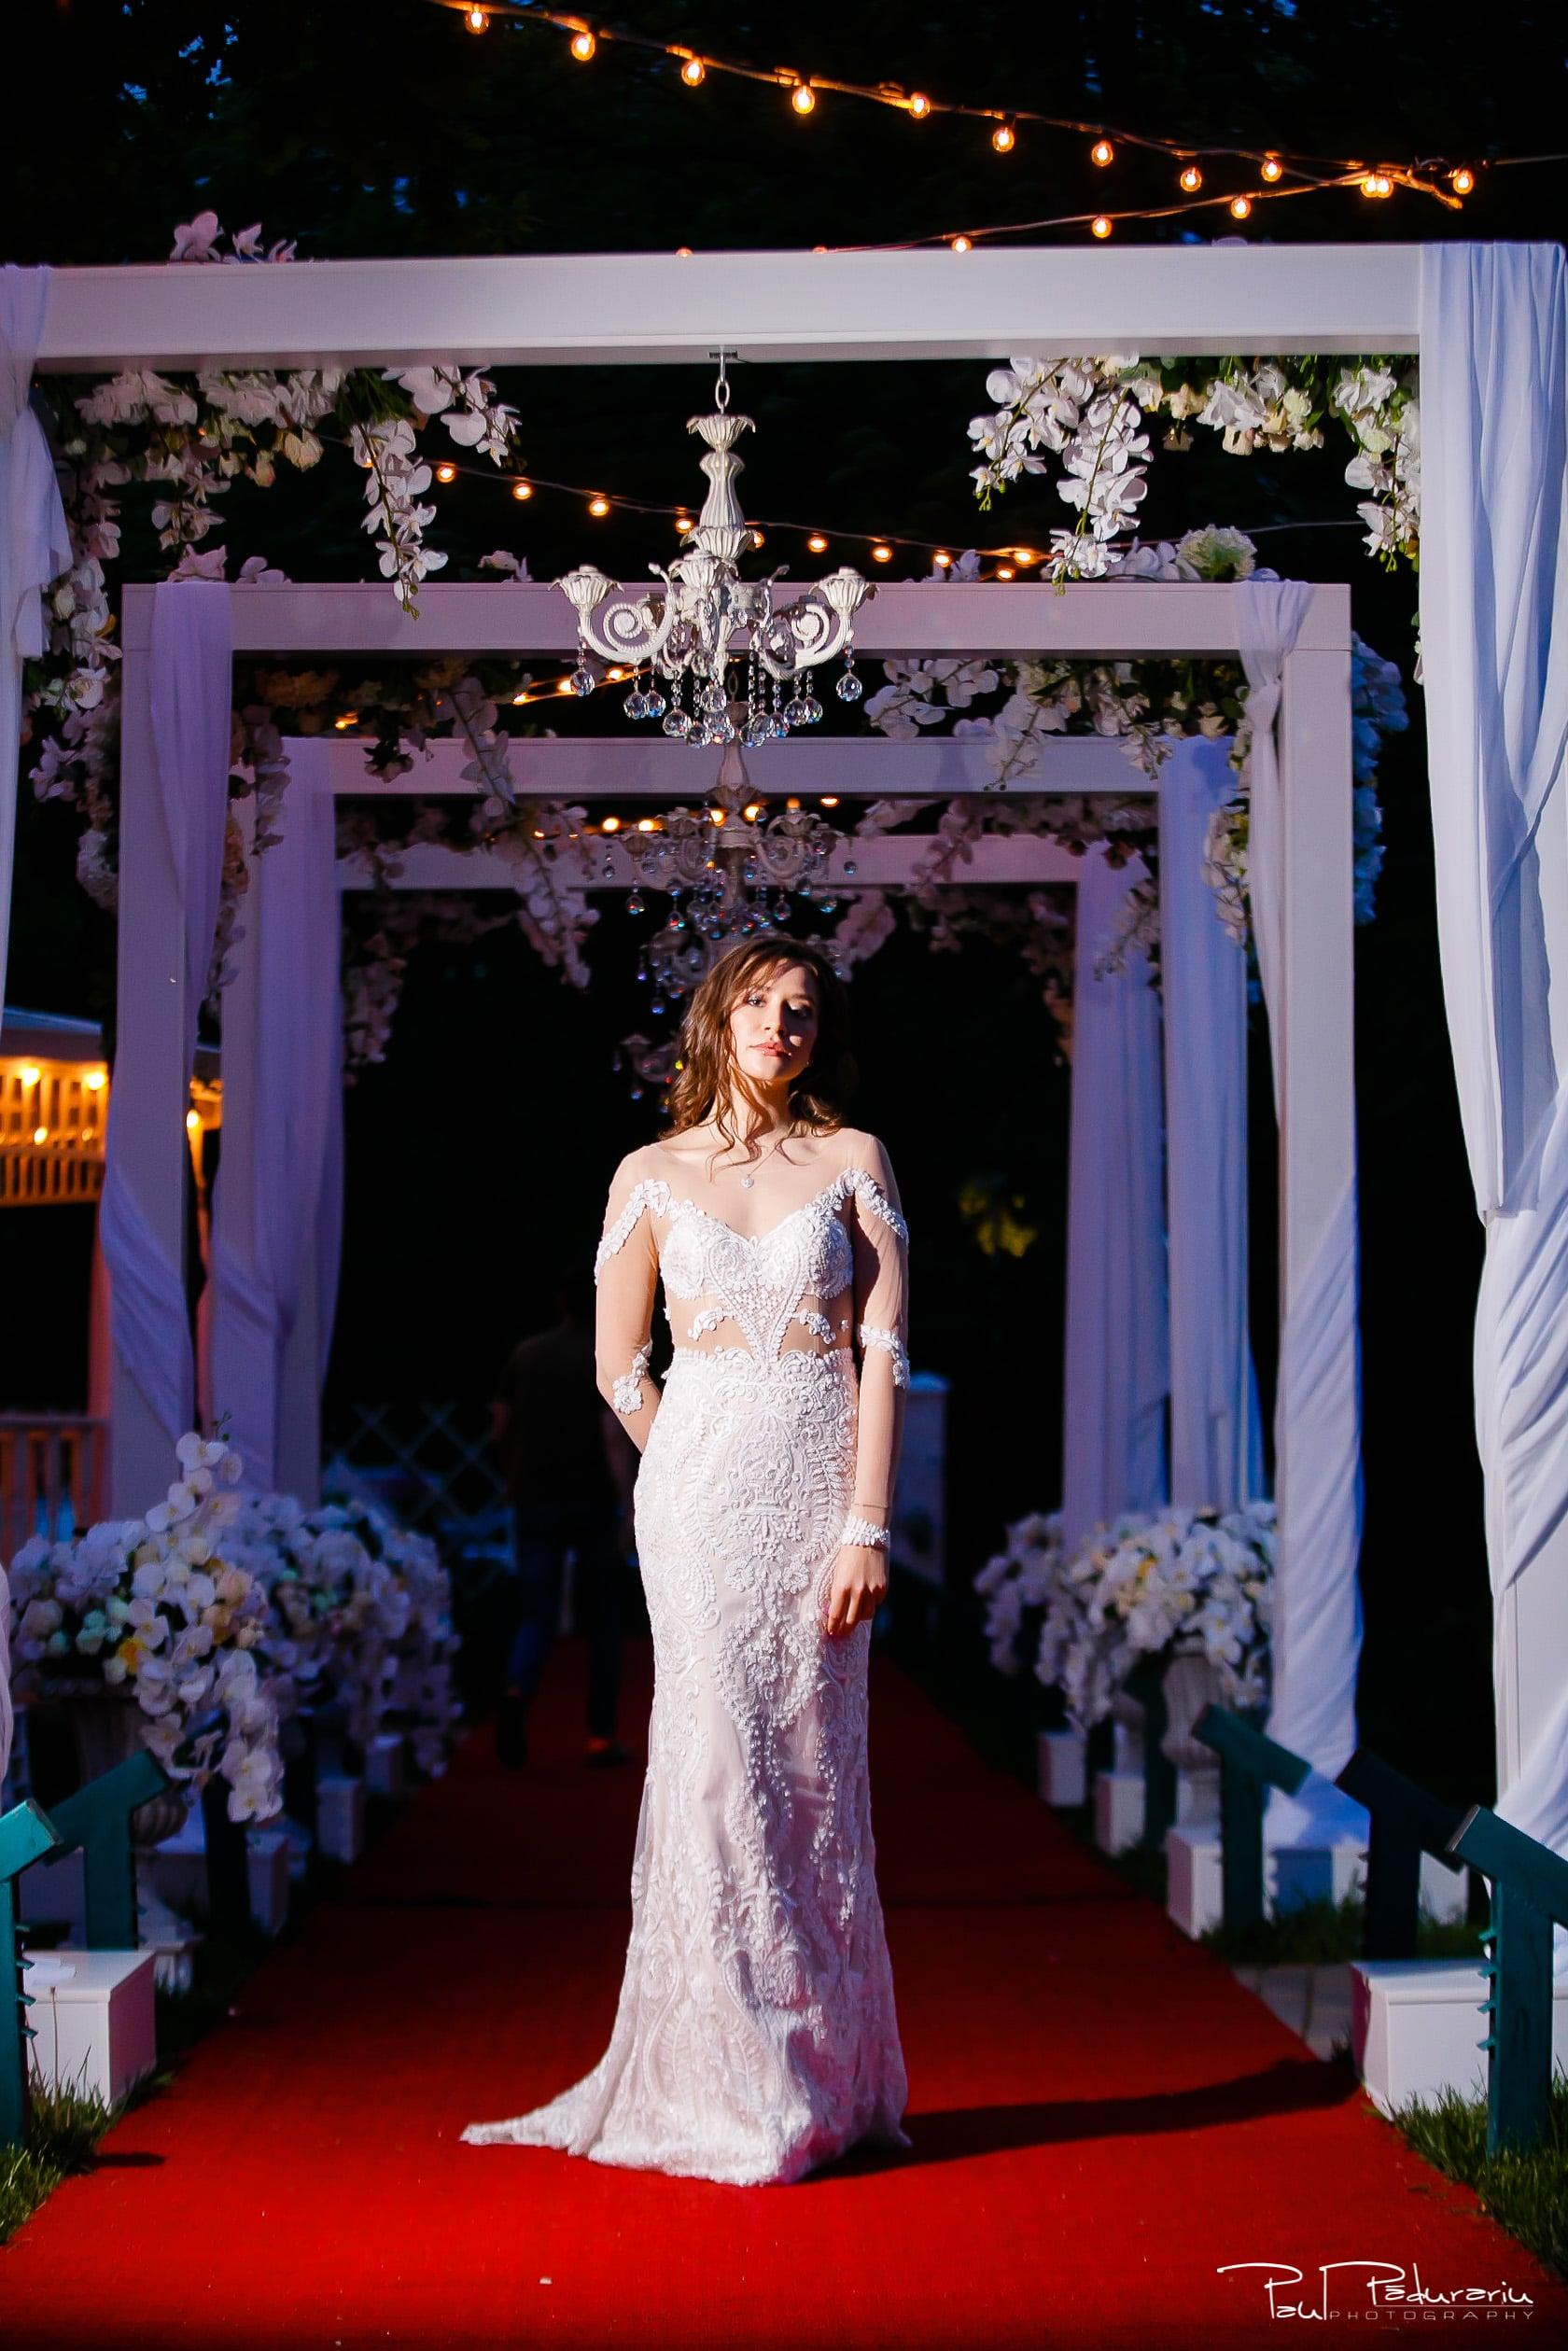 Modern Bride Edith Val colectie rochie mireasa 2019 - fotograf profesionist iasi paul padurariu | nunta iasi 15